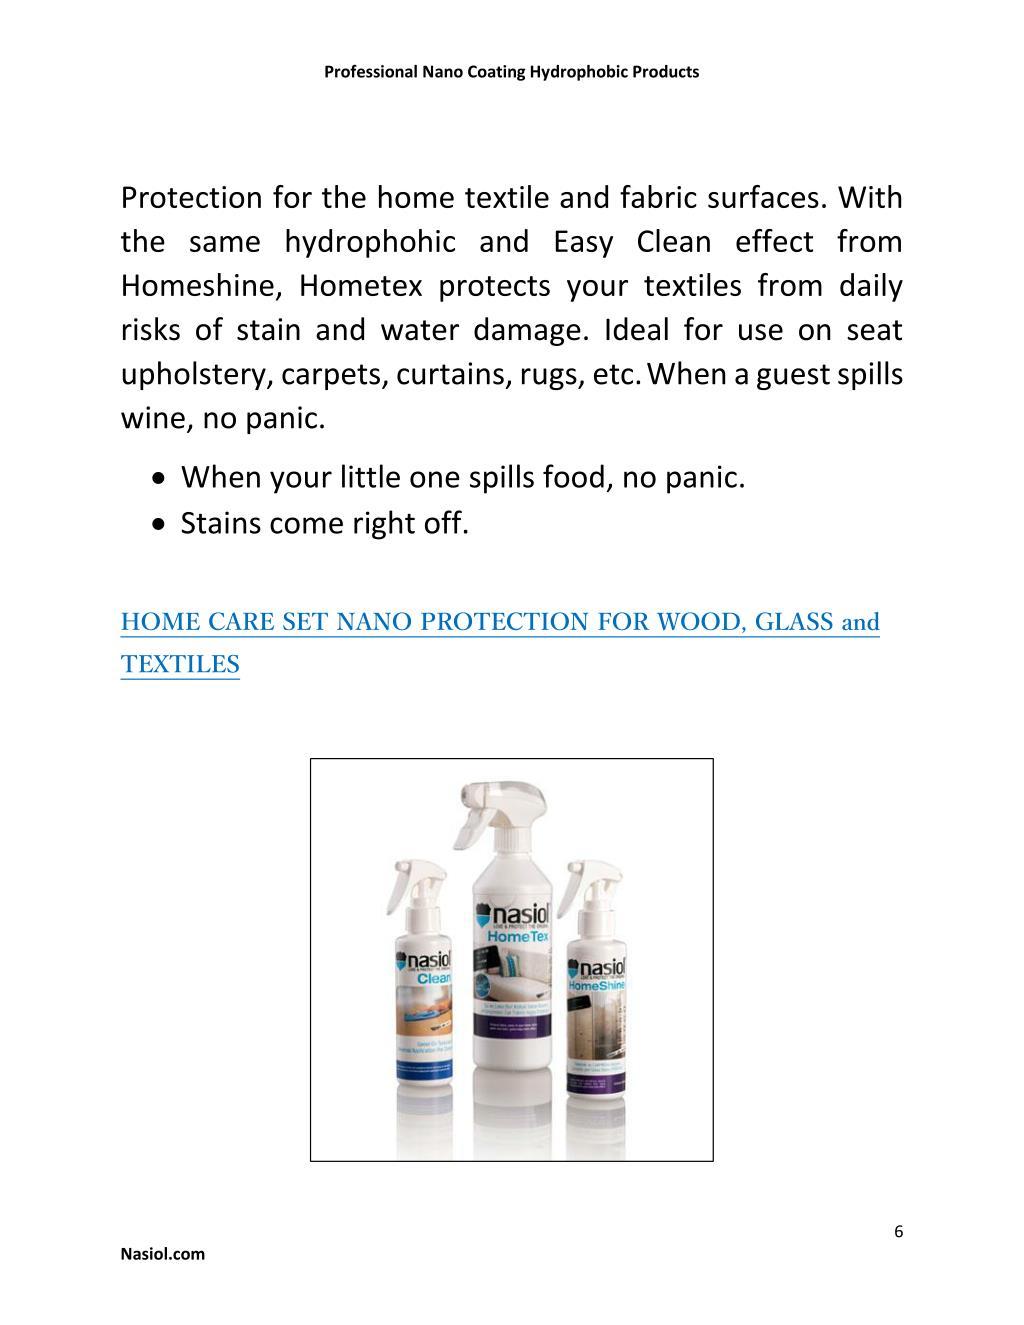 PPT - Professional Nano Coating Hydrophobic Products